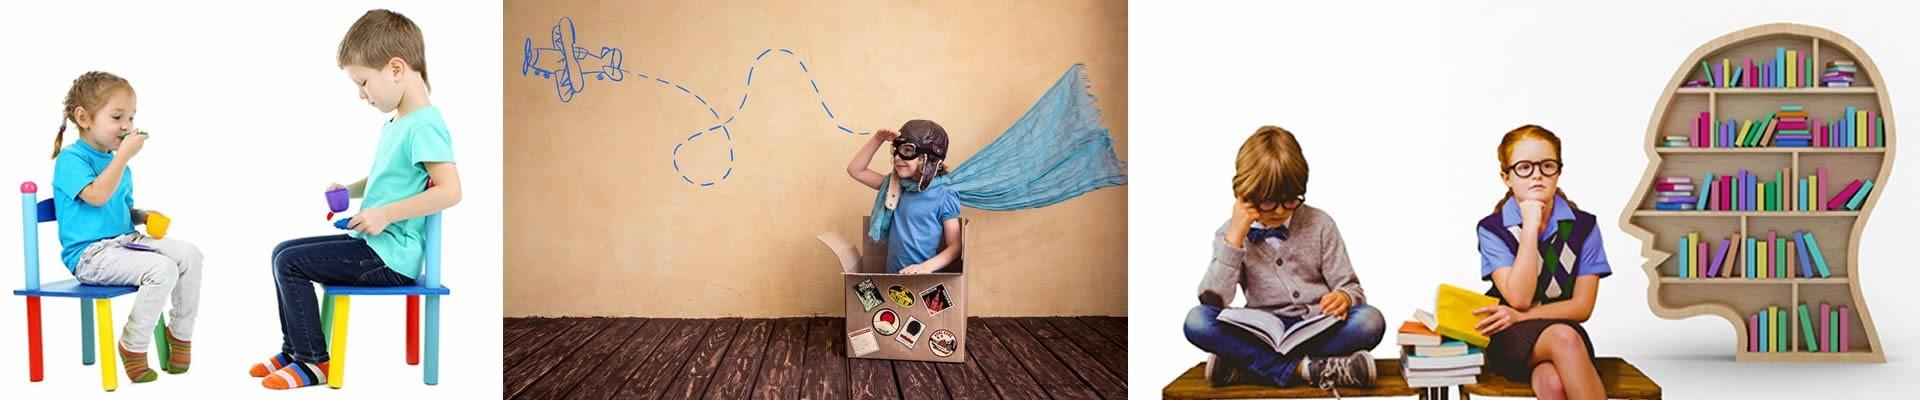 Kid's Furniture | Nursery & Children's Bedroom Furniture